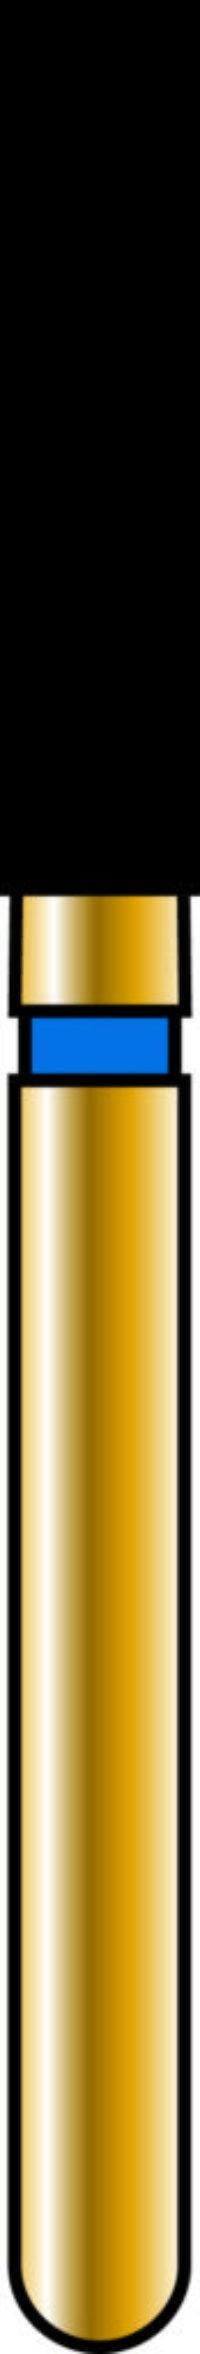 Flat End Cylinder 18-8mm Gold Diamond Bur